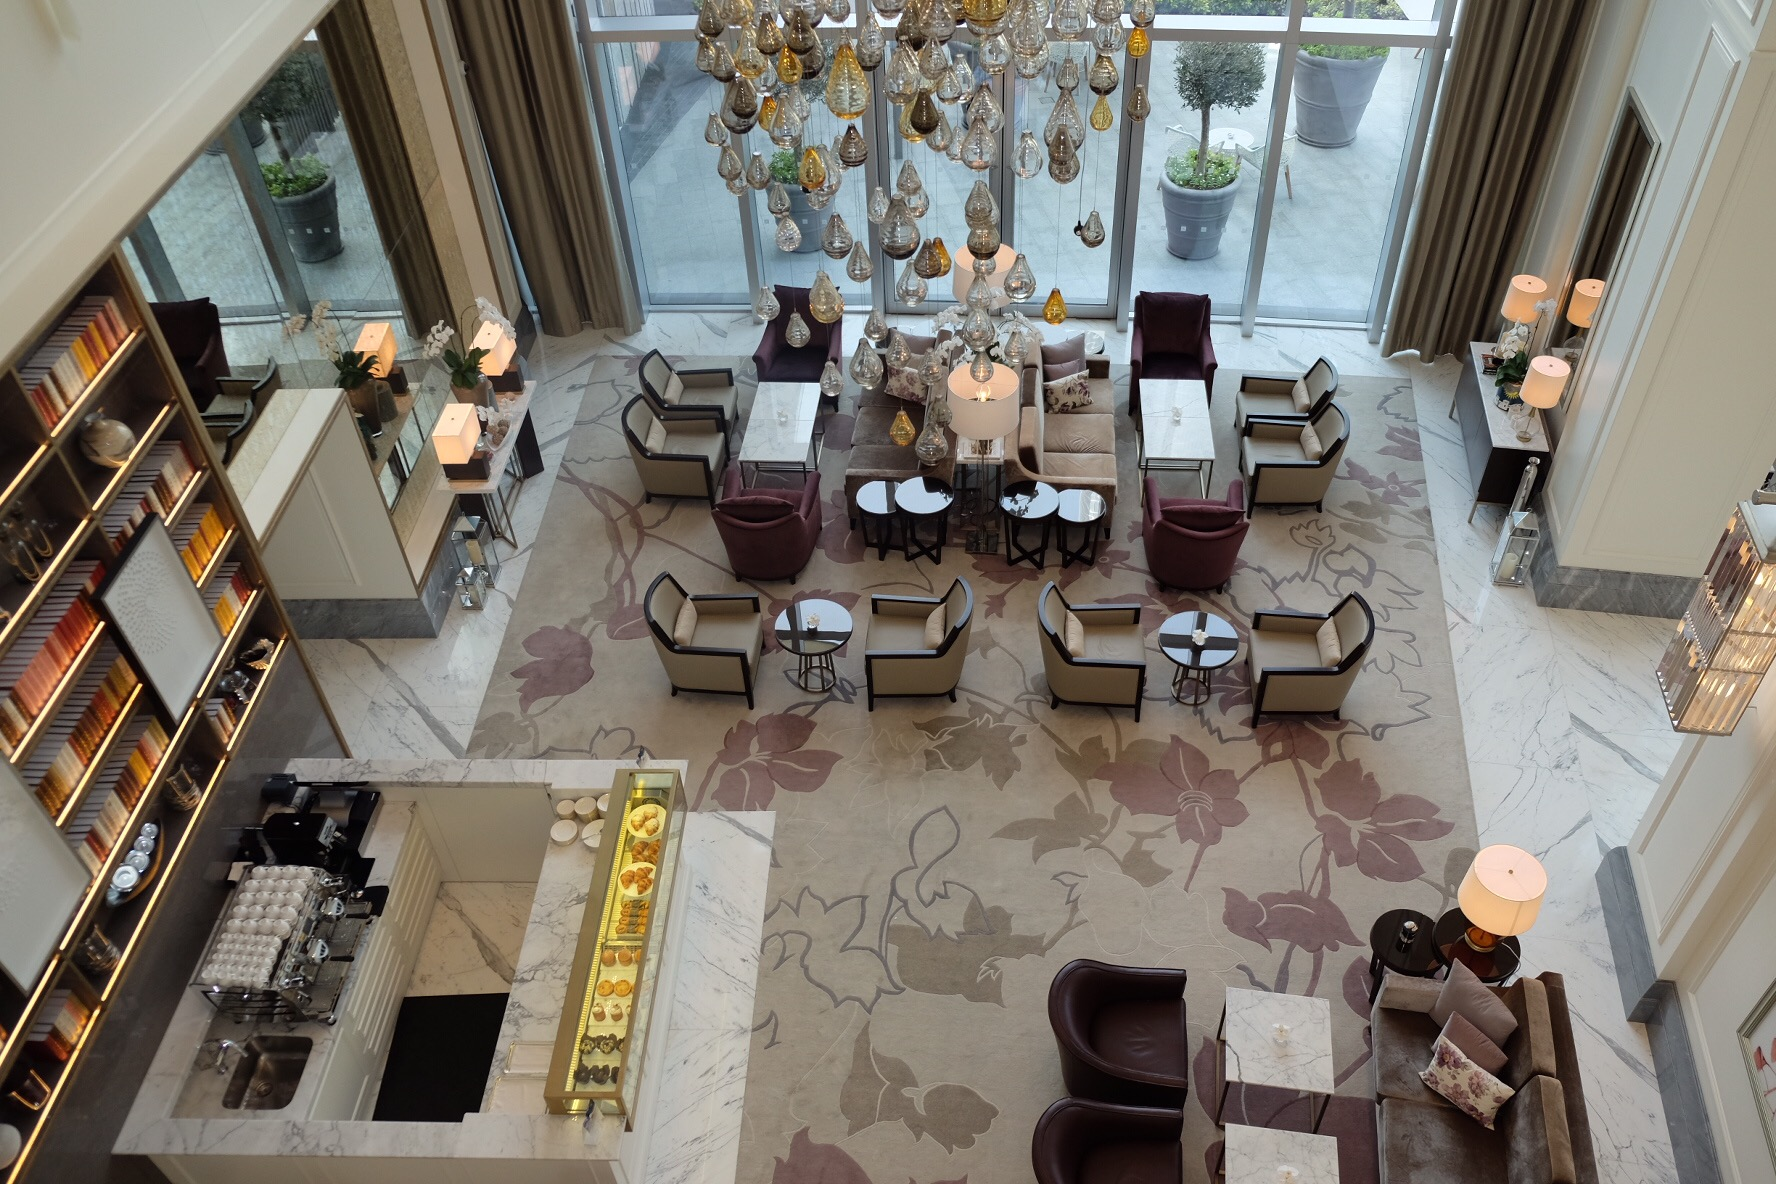 Afternoon tea at the lounge address boulevard u nilofar khan